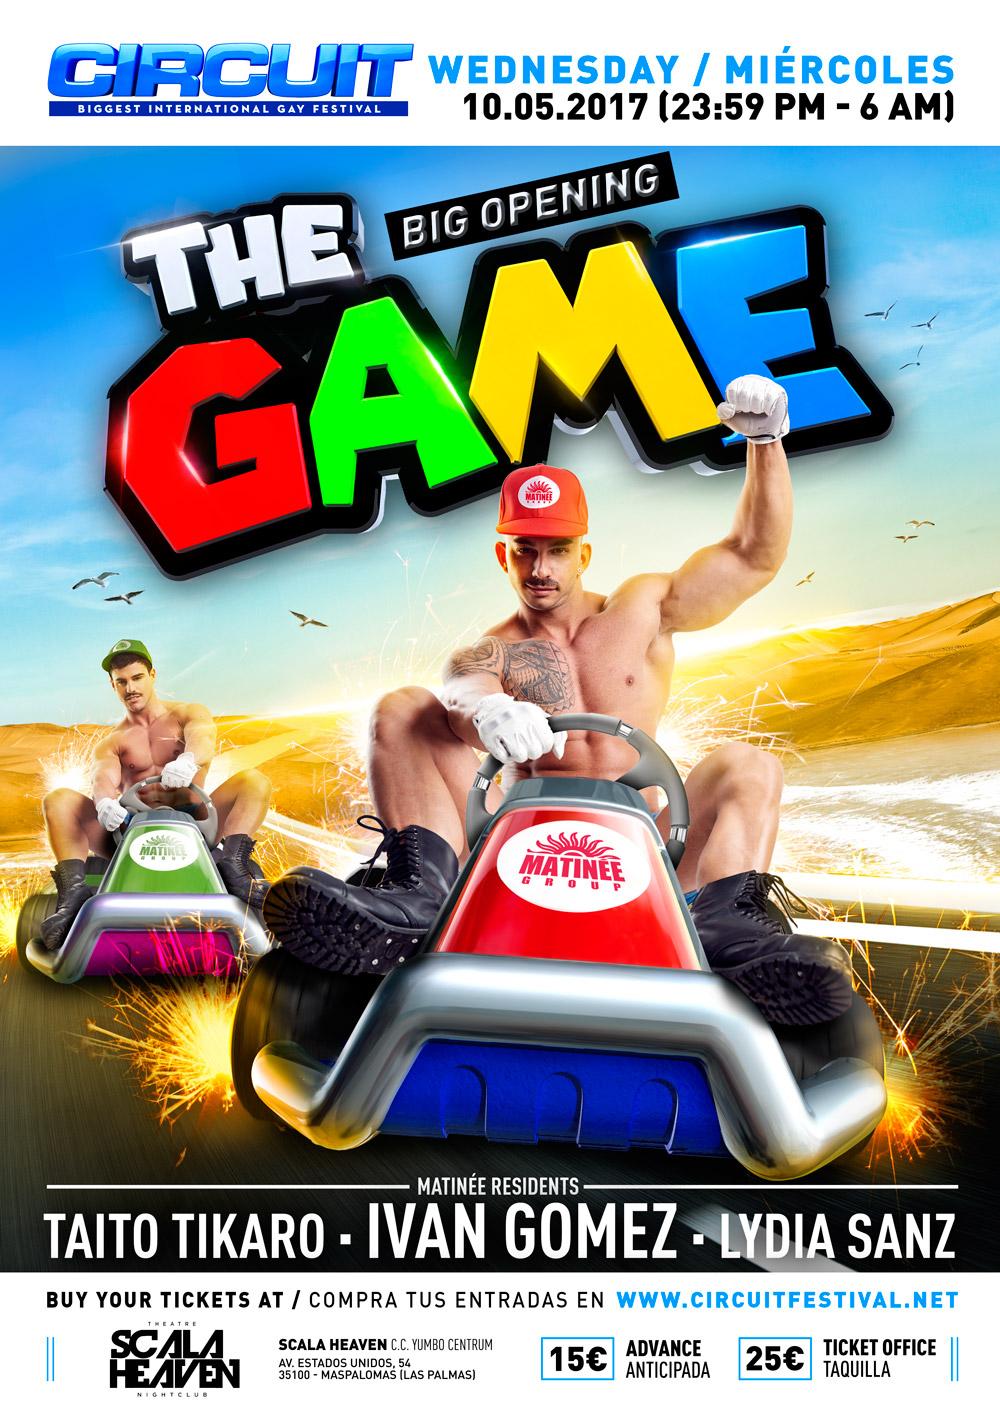 the-game-party-gay-maspalomas-group-matinee-circuit